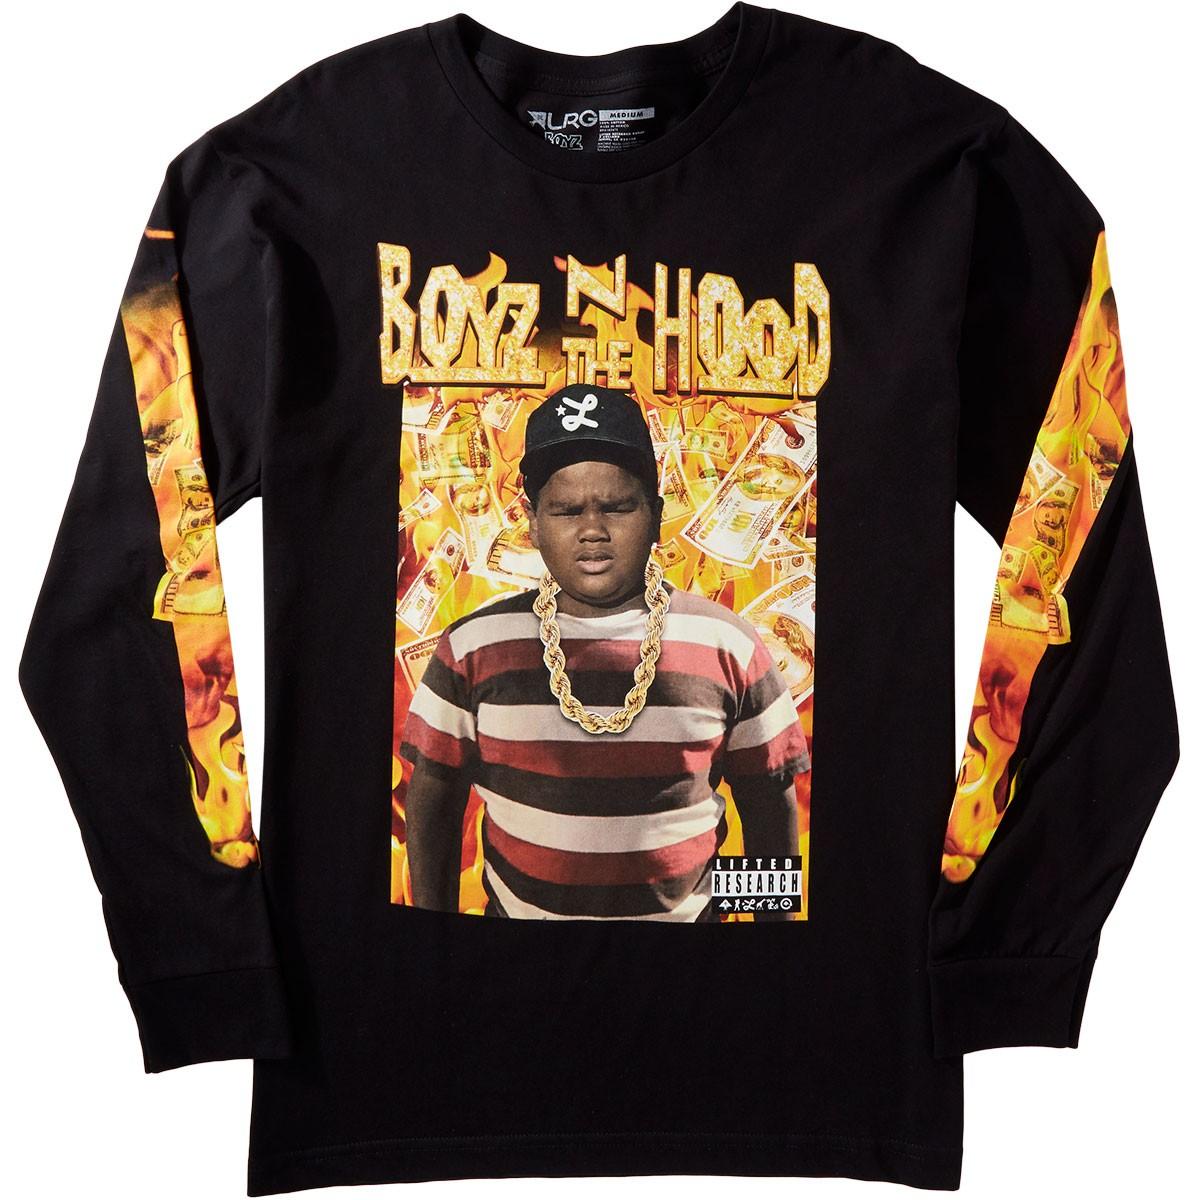 4. Boyz in the Hood Doughboy Tee - Brand: LRGPrice $31.95